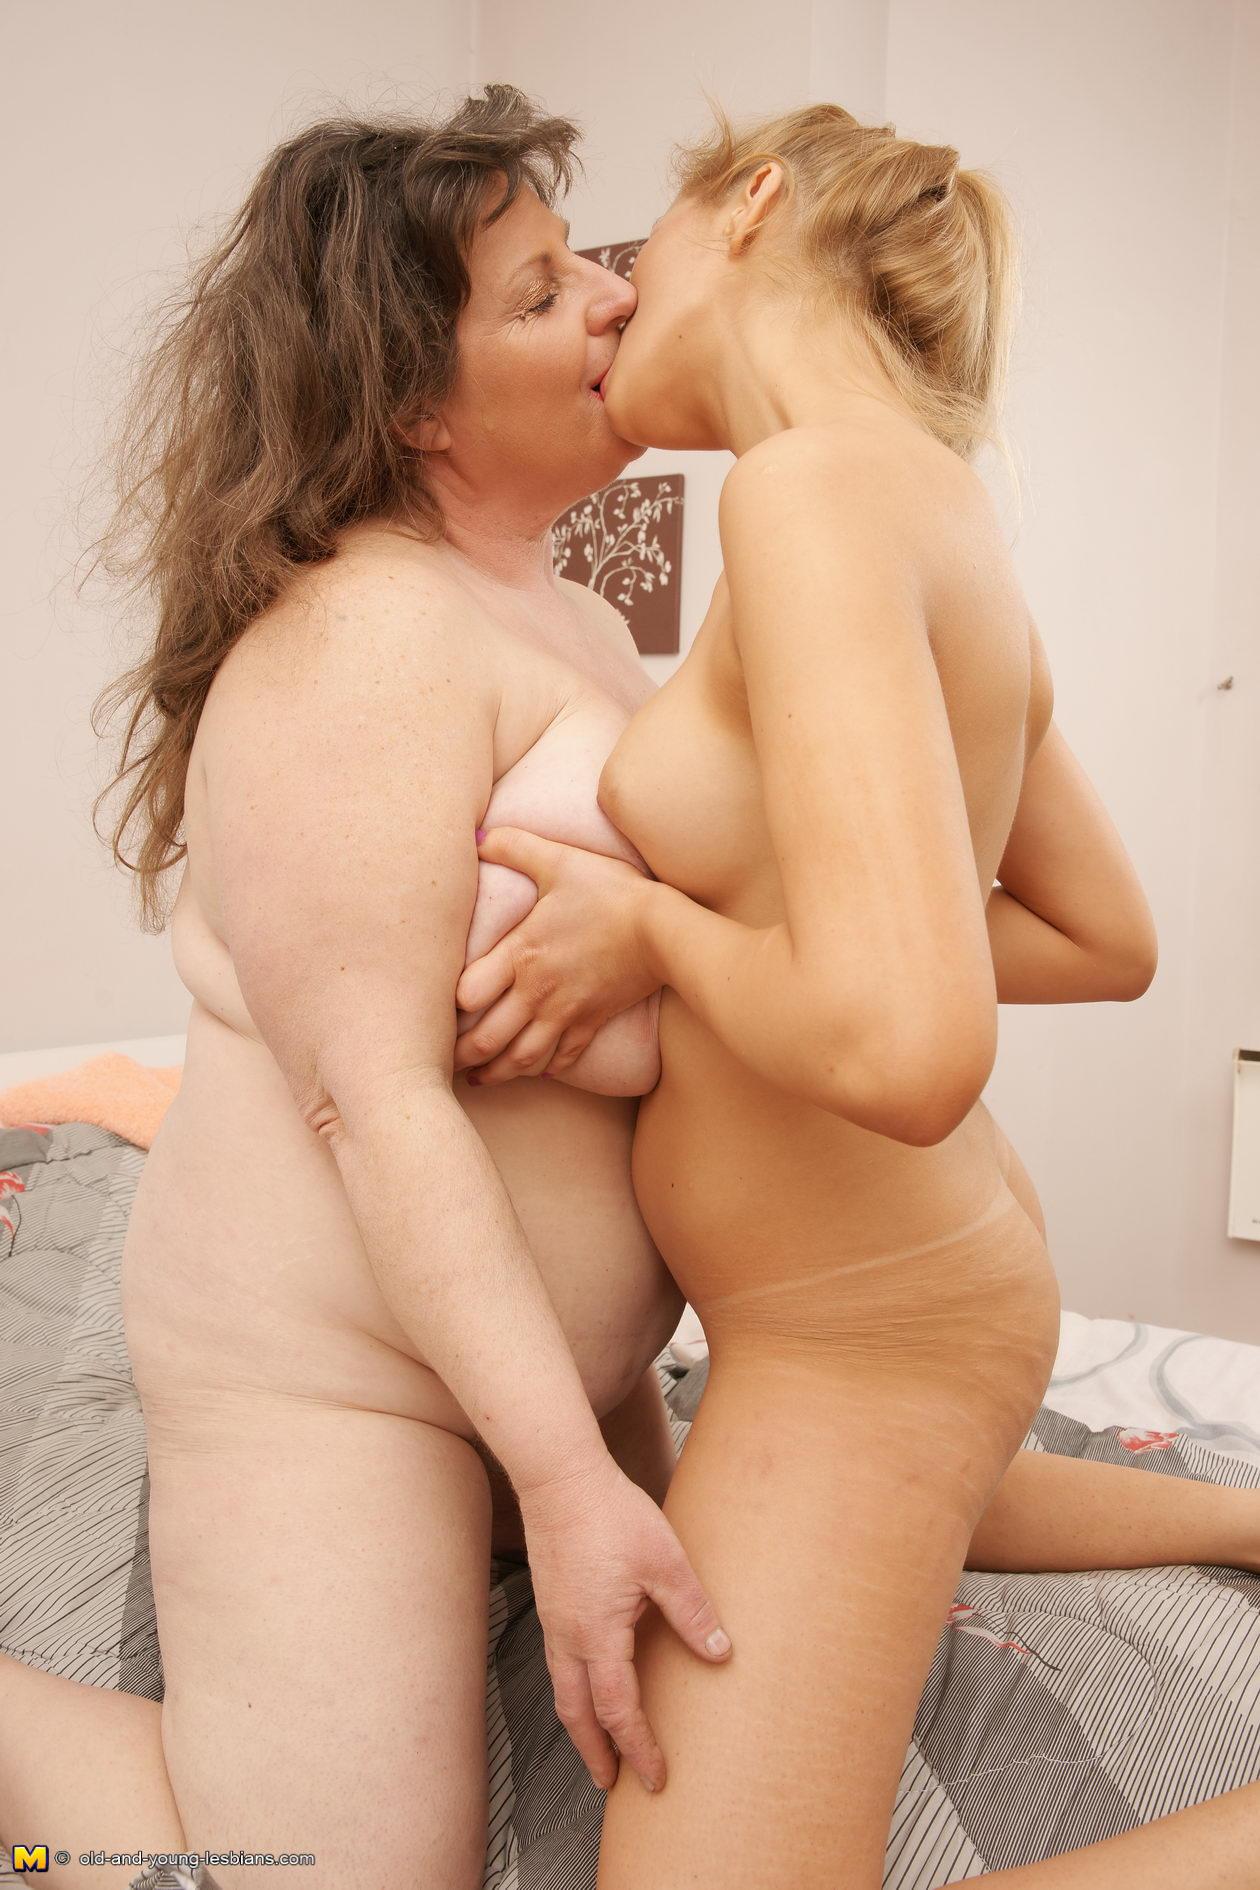 Older women lesbian sex